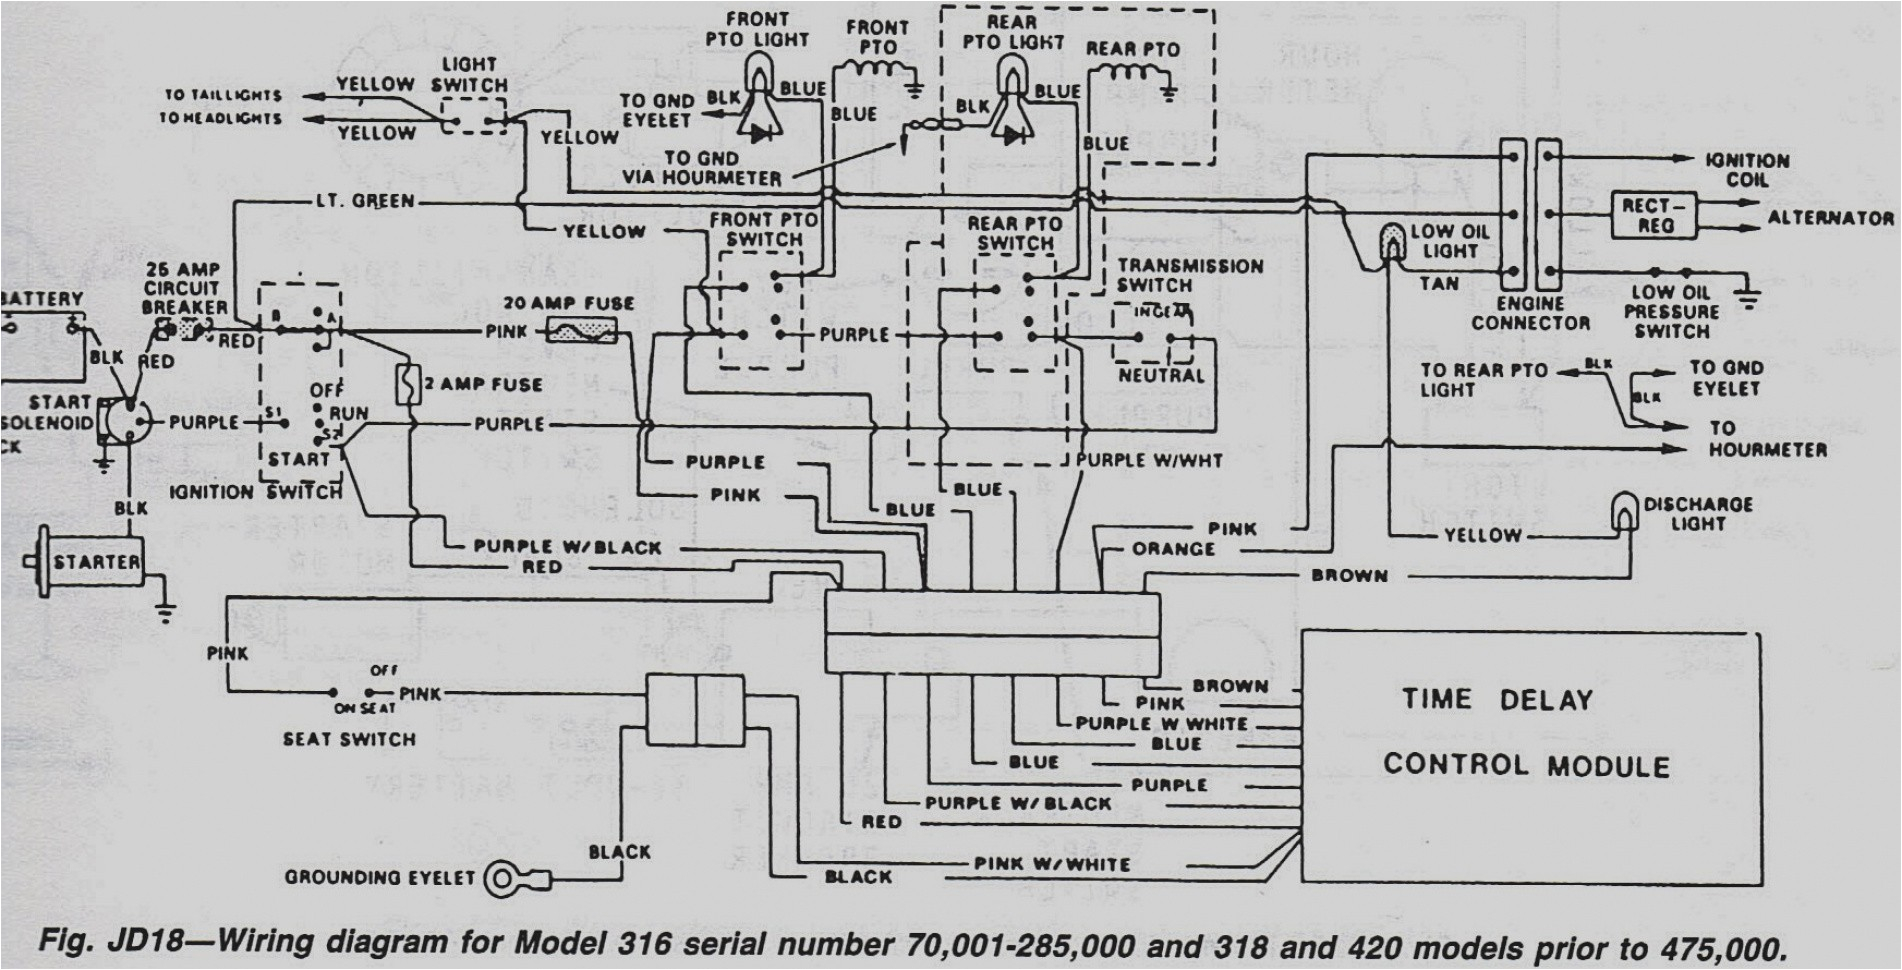 410 john deere wiring diagrams pdf john deere 410 specifications jd 410 ignition wiring diagram